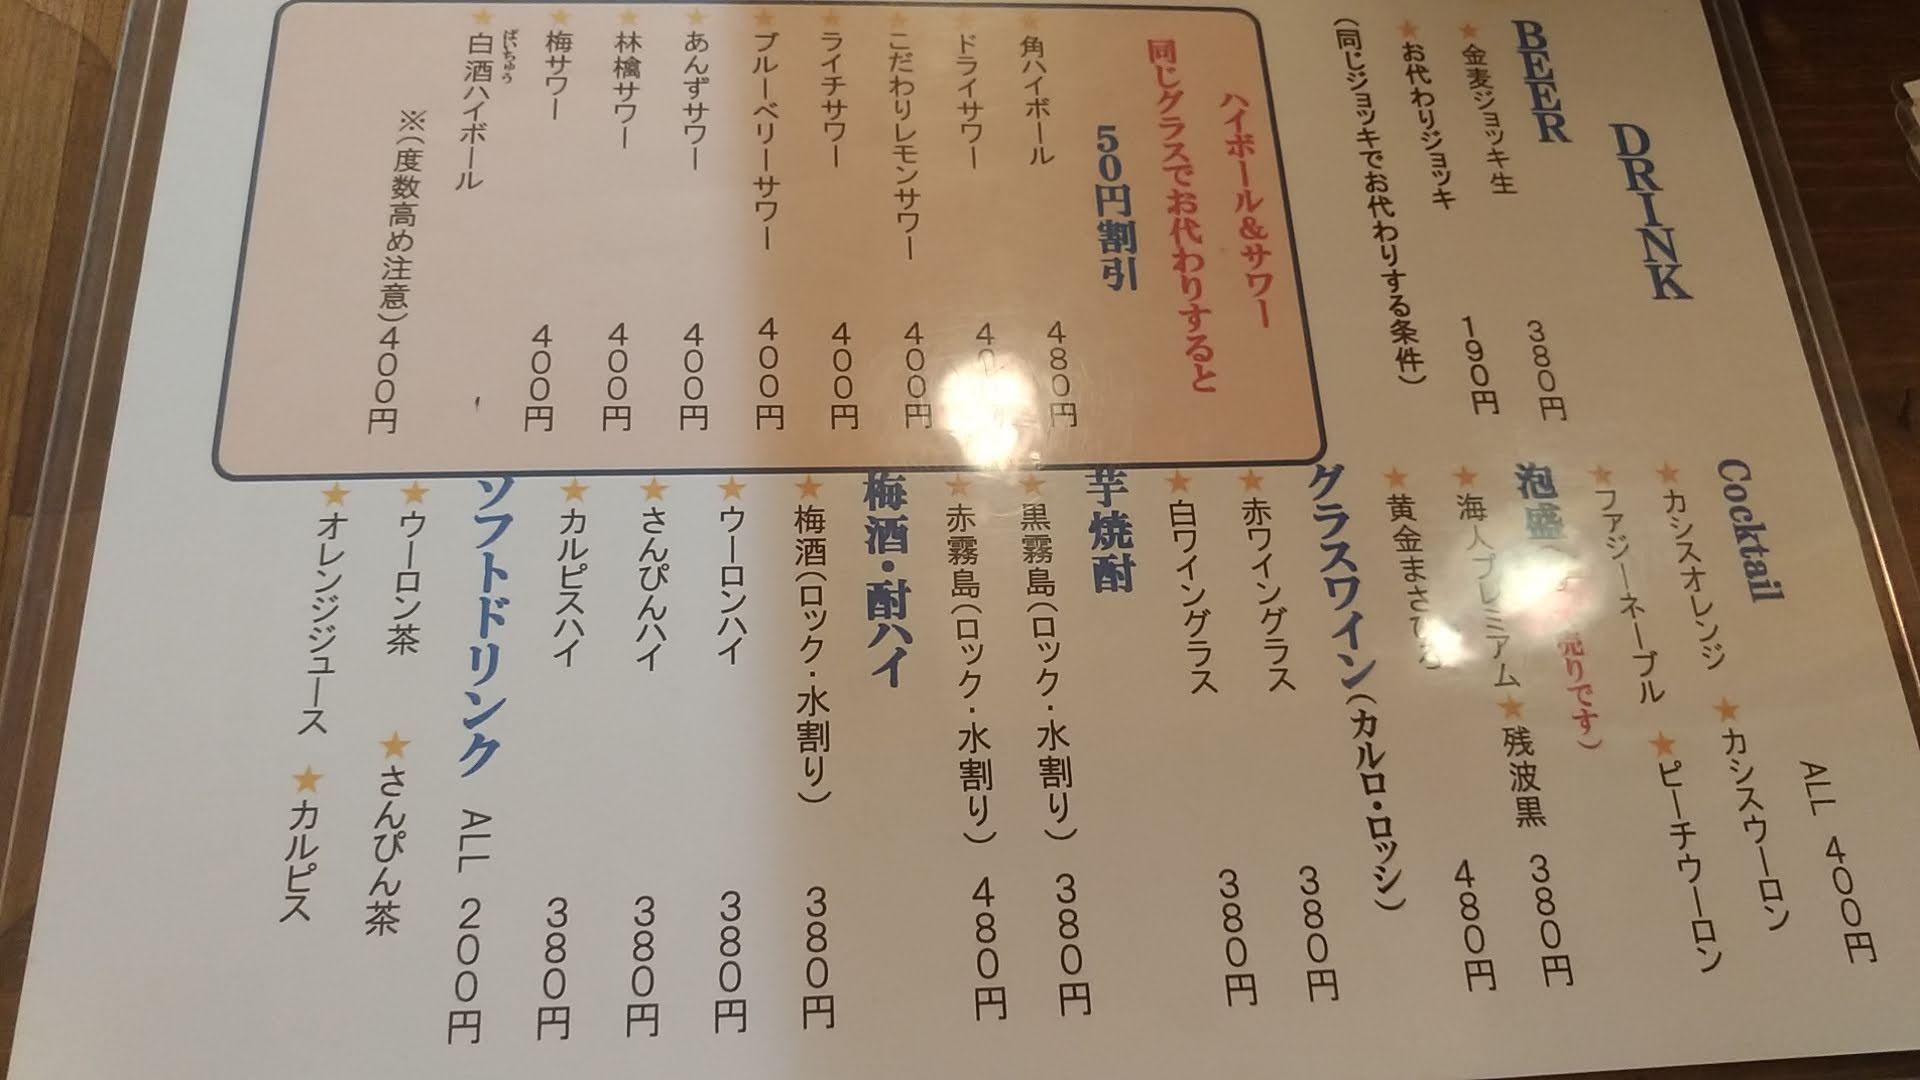 The drink menu of Shinka 1